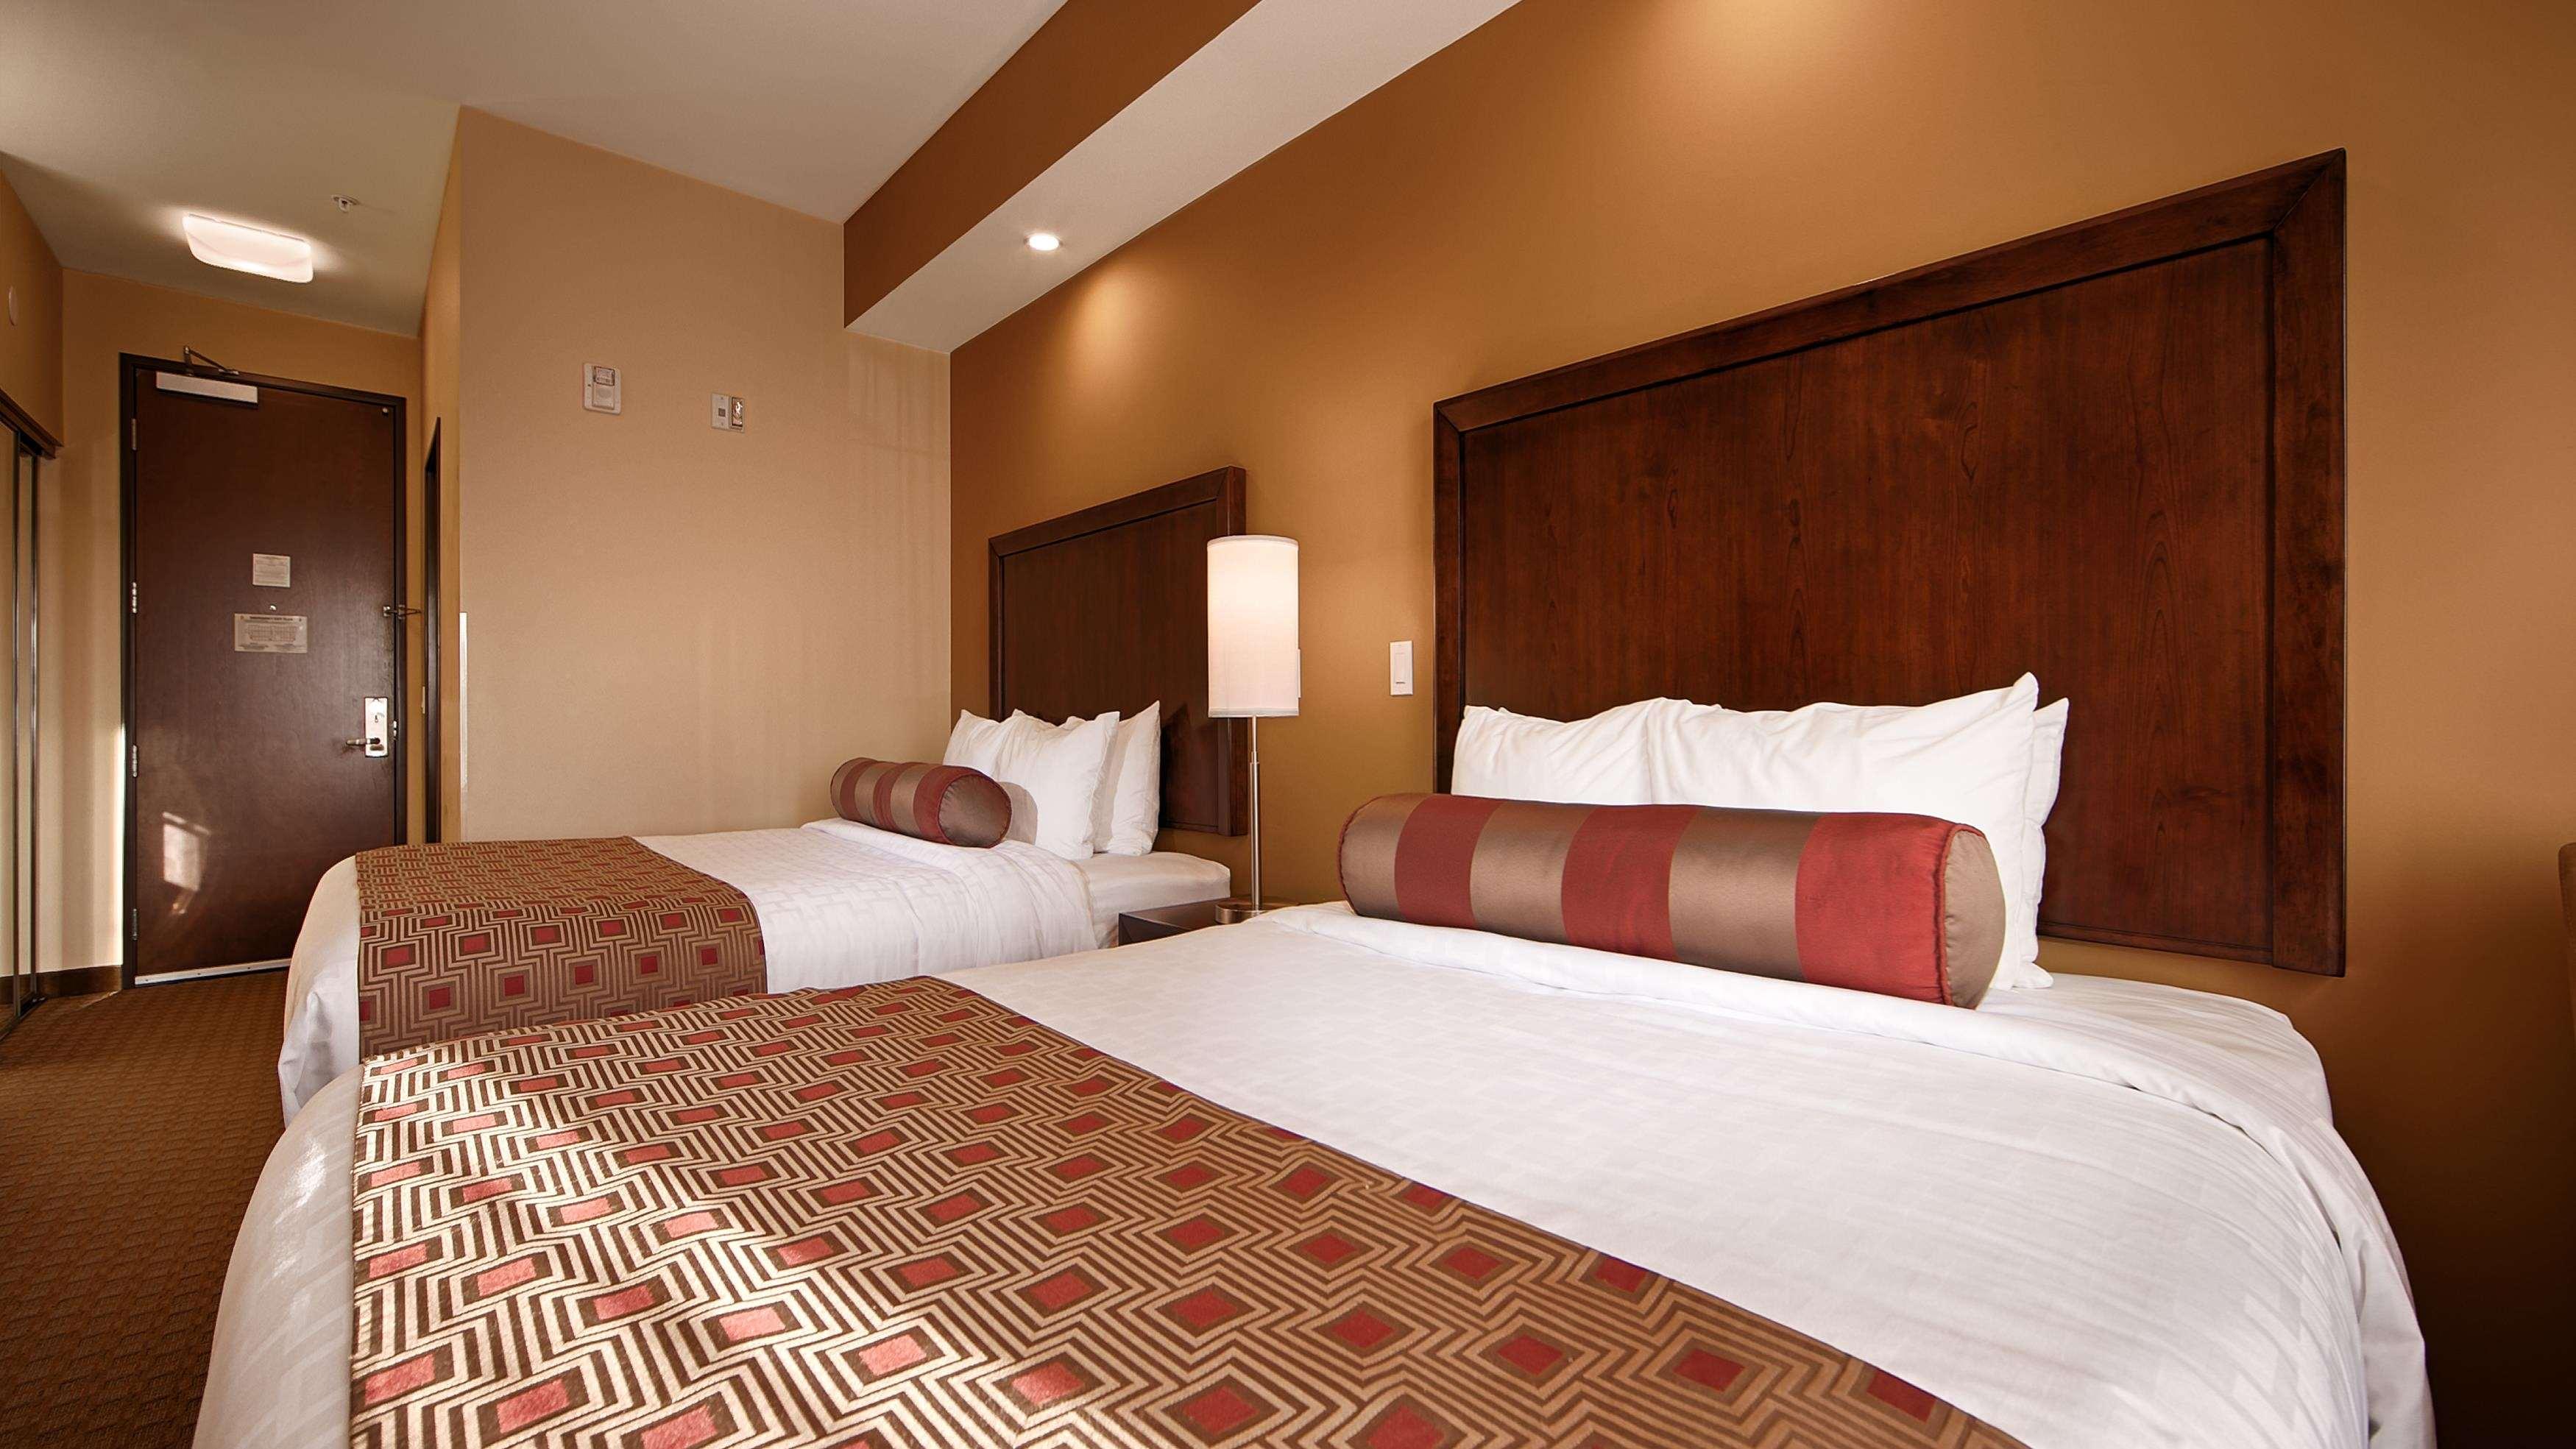 Best Western Plus Lacey Inn & Suites image 19